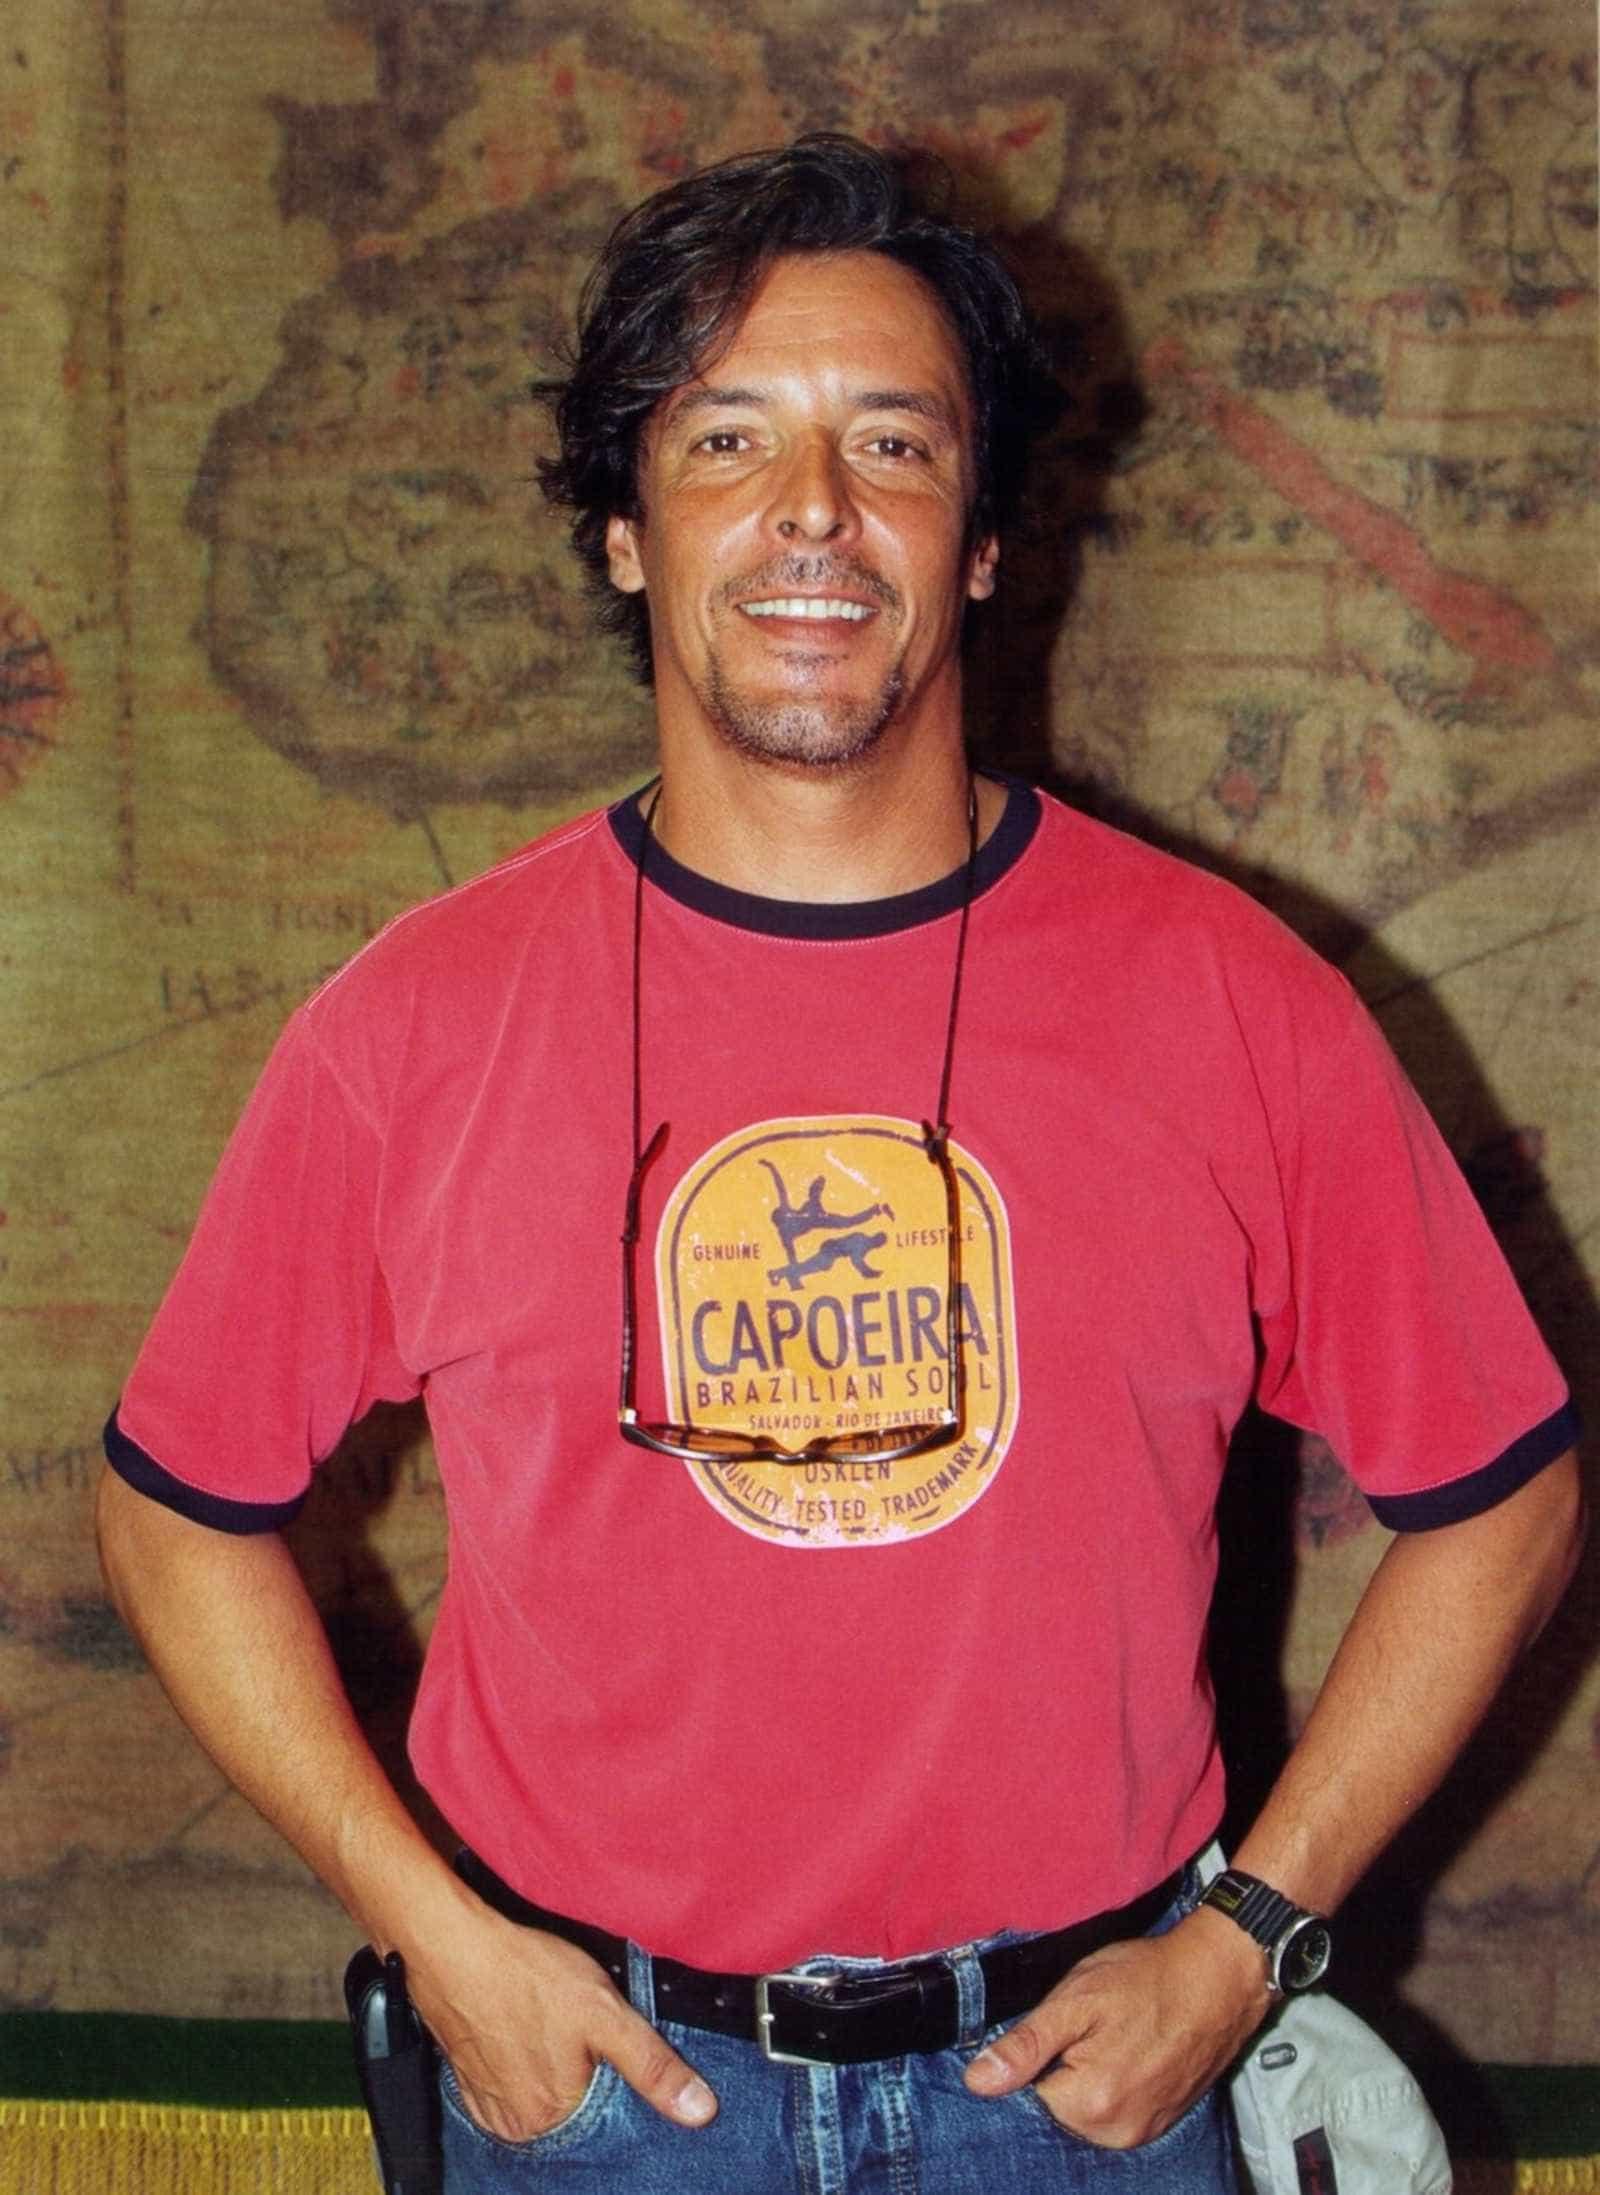 Morreu o ator brasileiro D'Artagnan Júnior